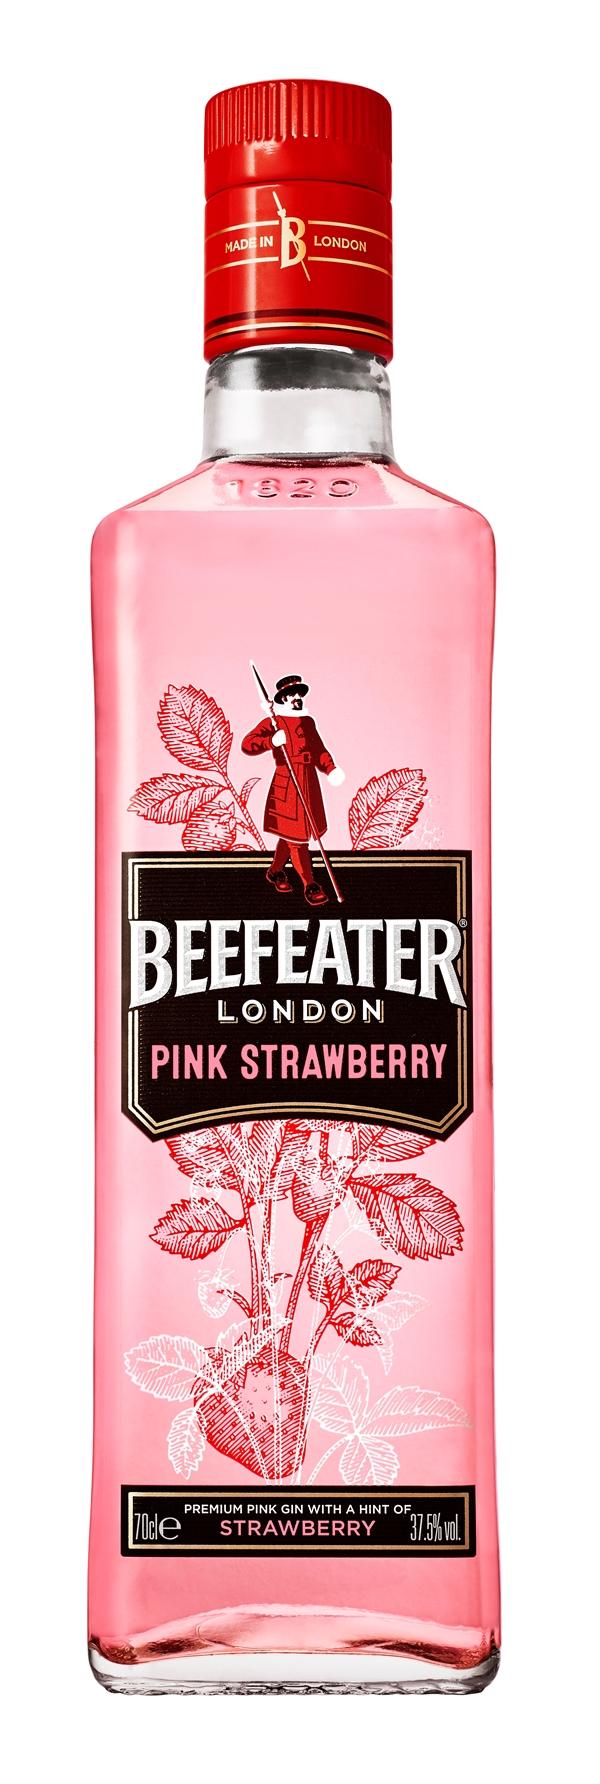 Специально к Ту бе-ав: Beefeater Pink – Strawberry